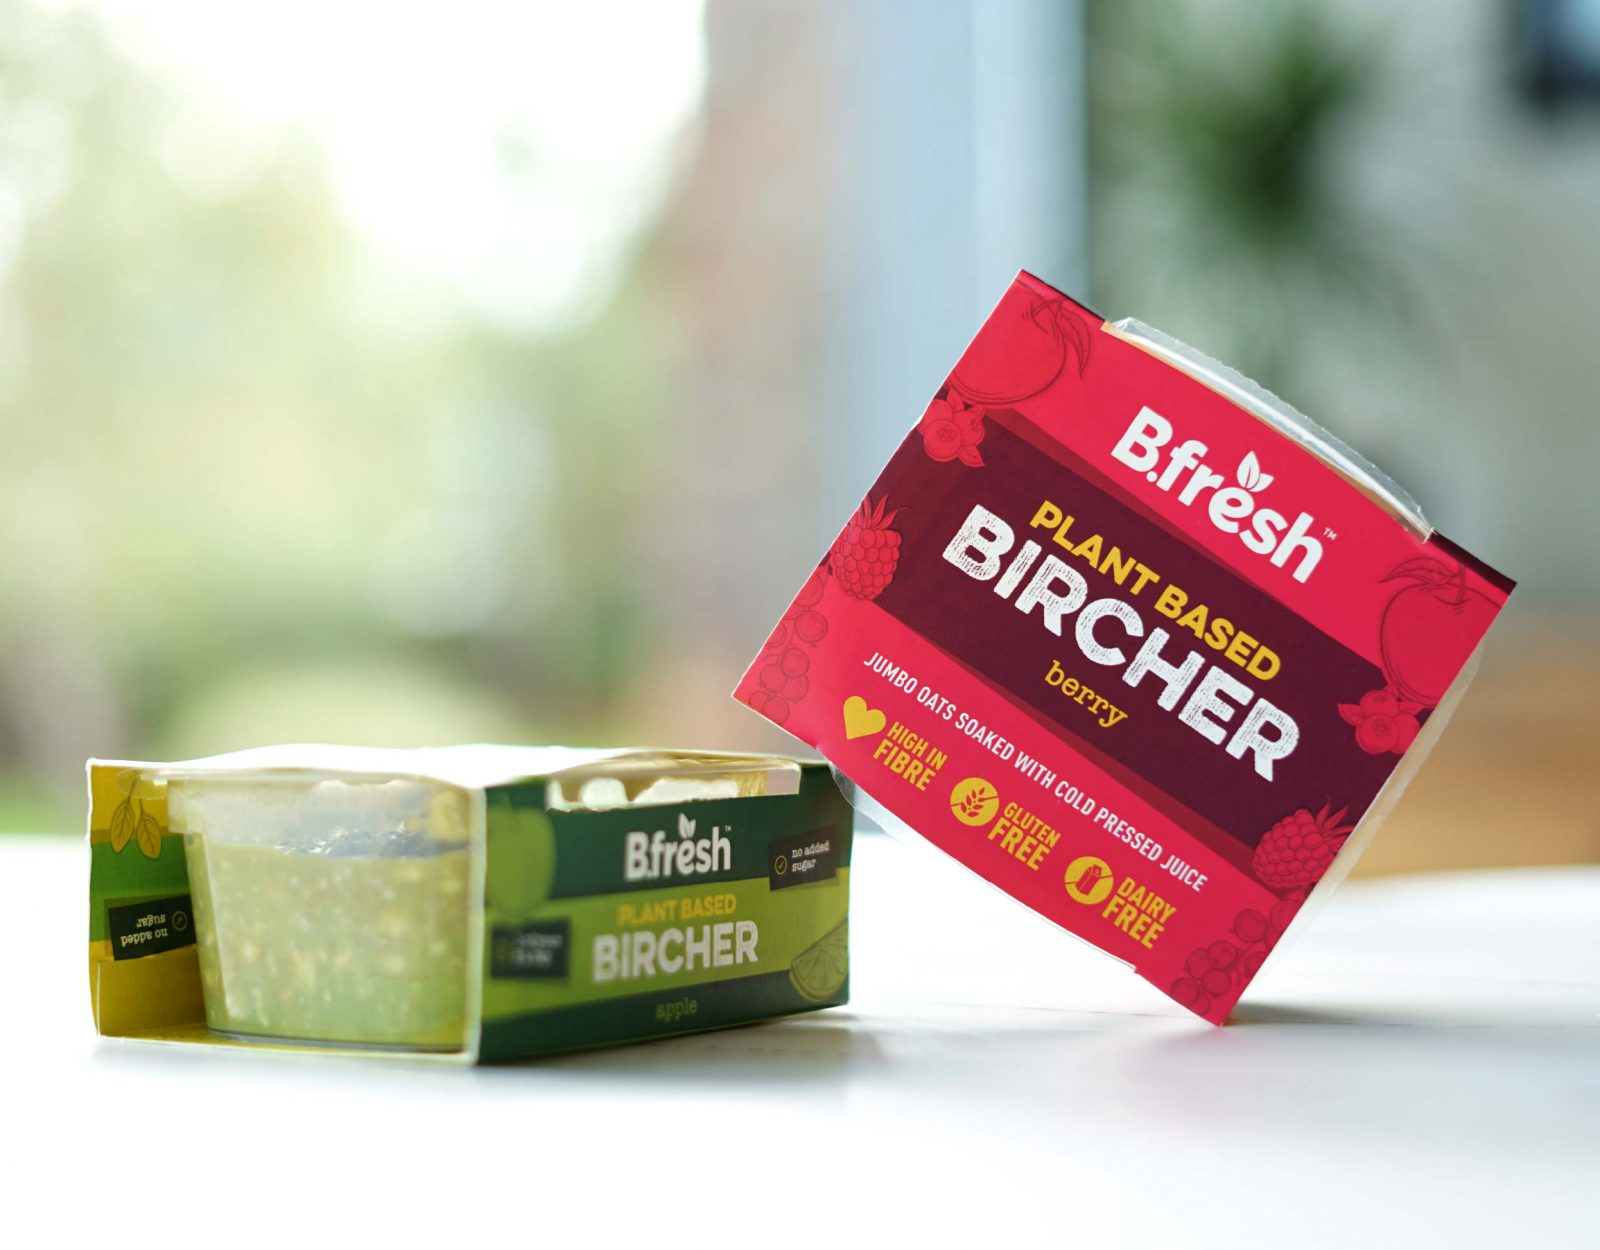 B.fresh Bircher